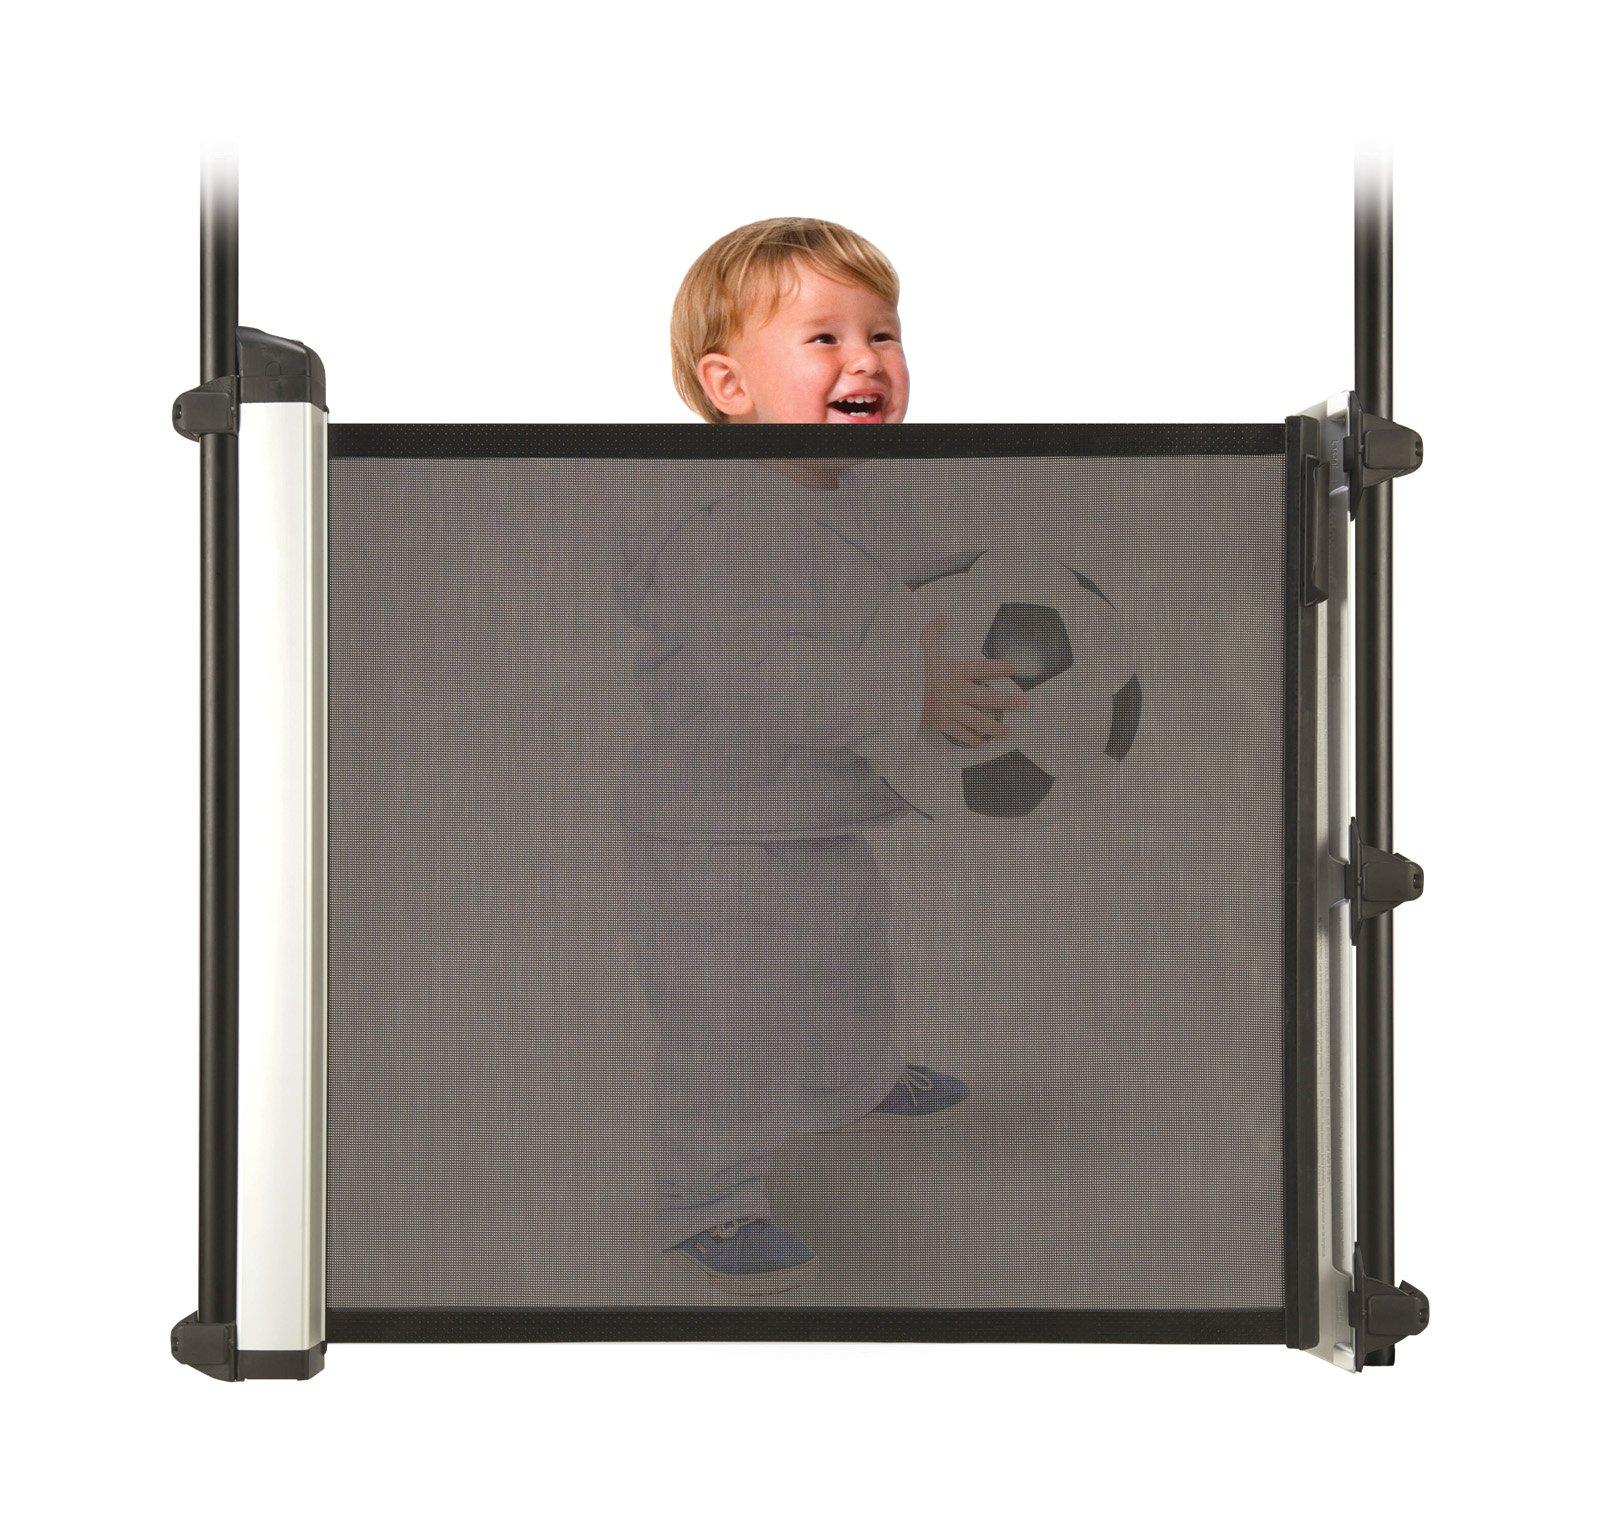 top 5 best retractable baby gates 2017 reviews petandbabygates